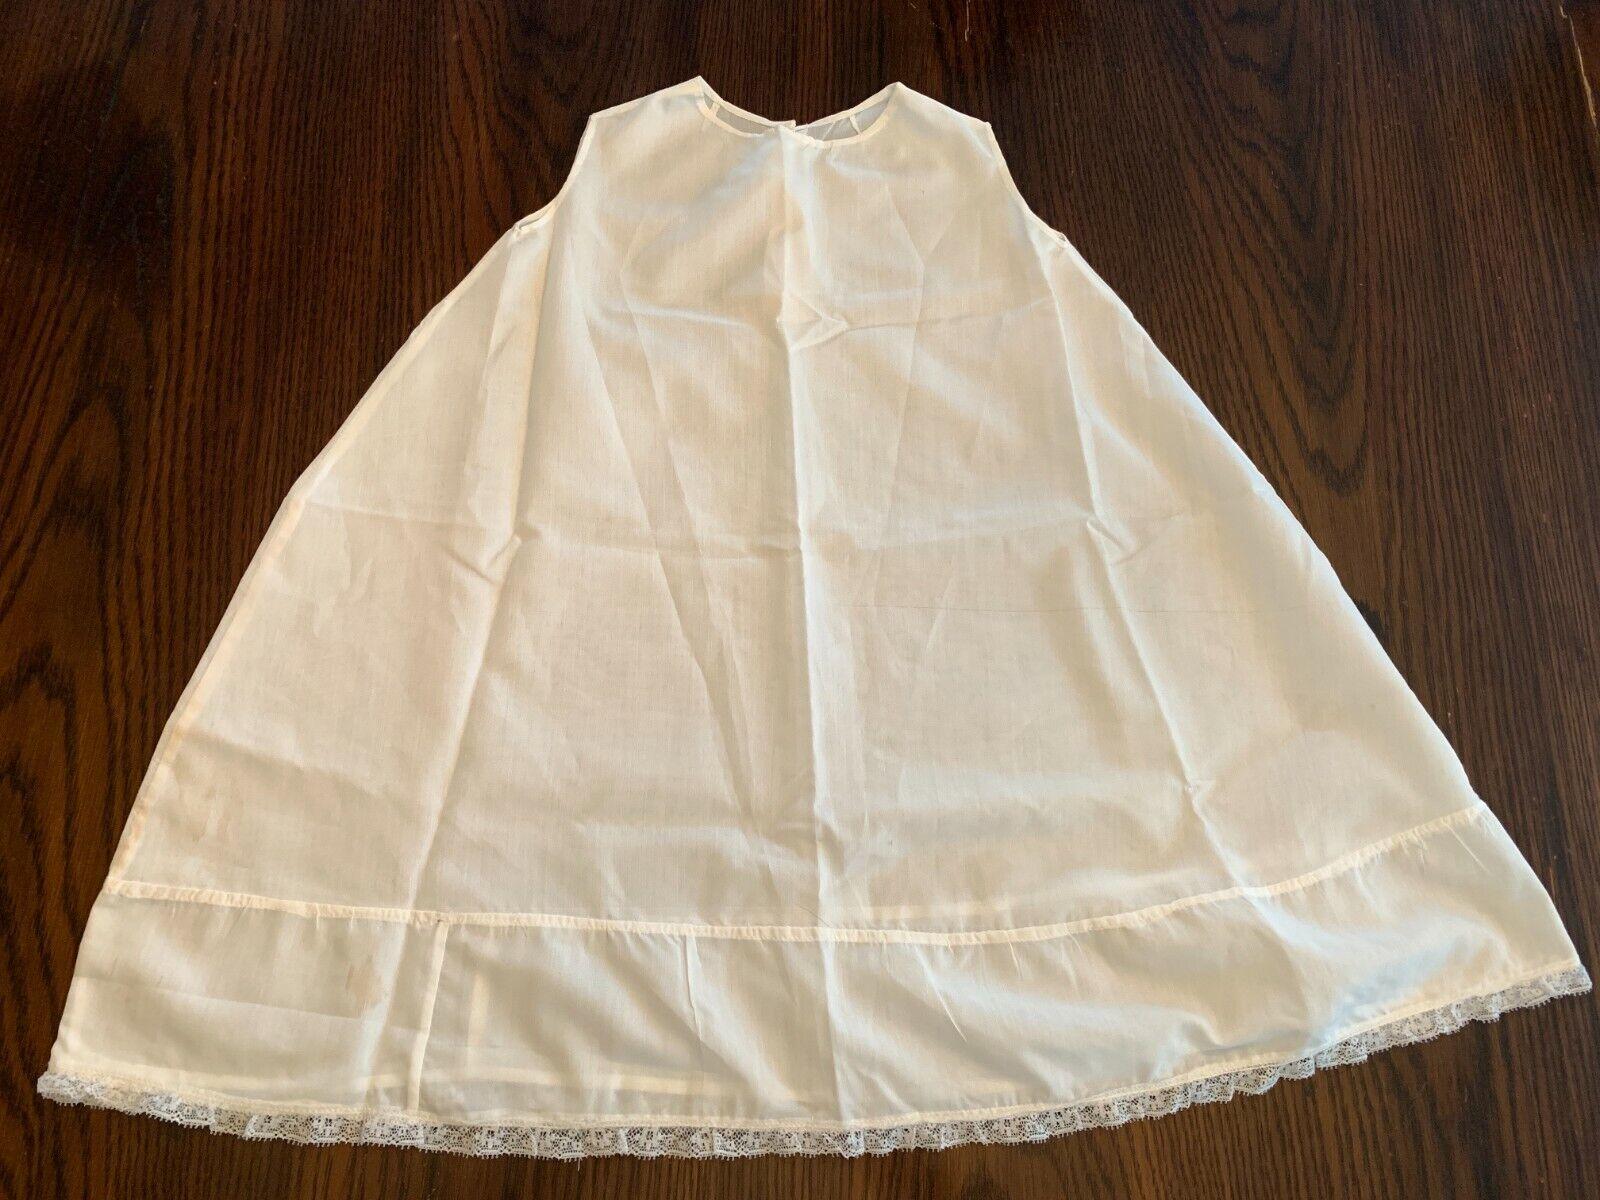 Vintage White Cotton Baby gown slip underdress sl… - image 1